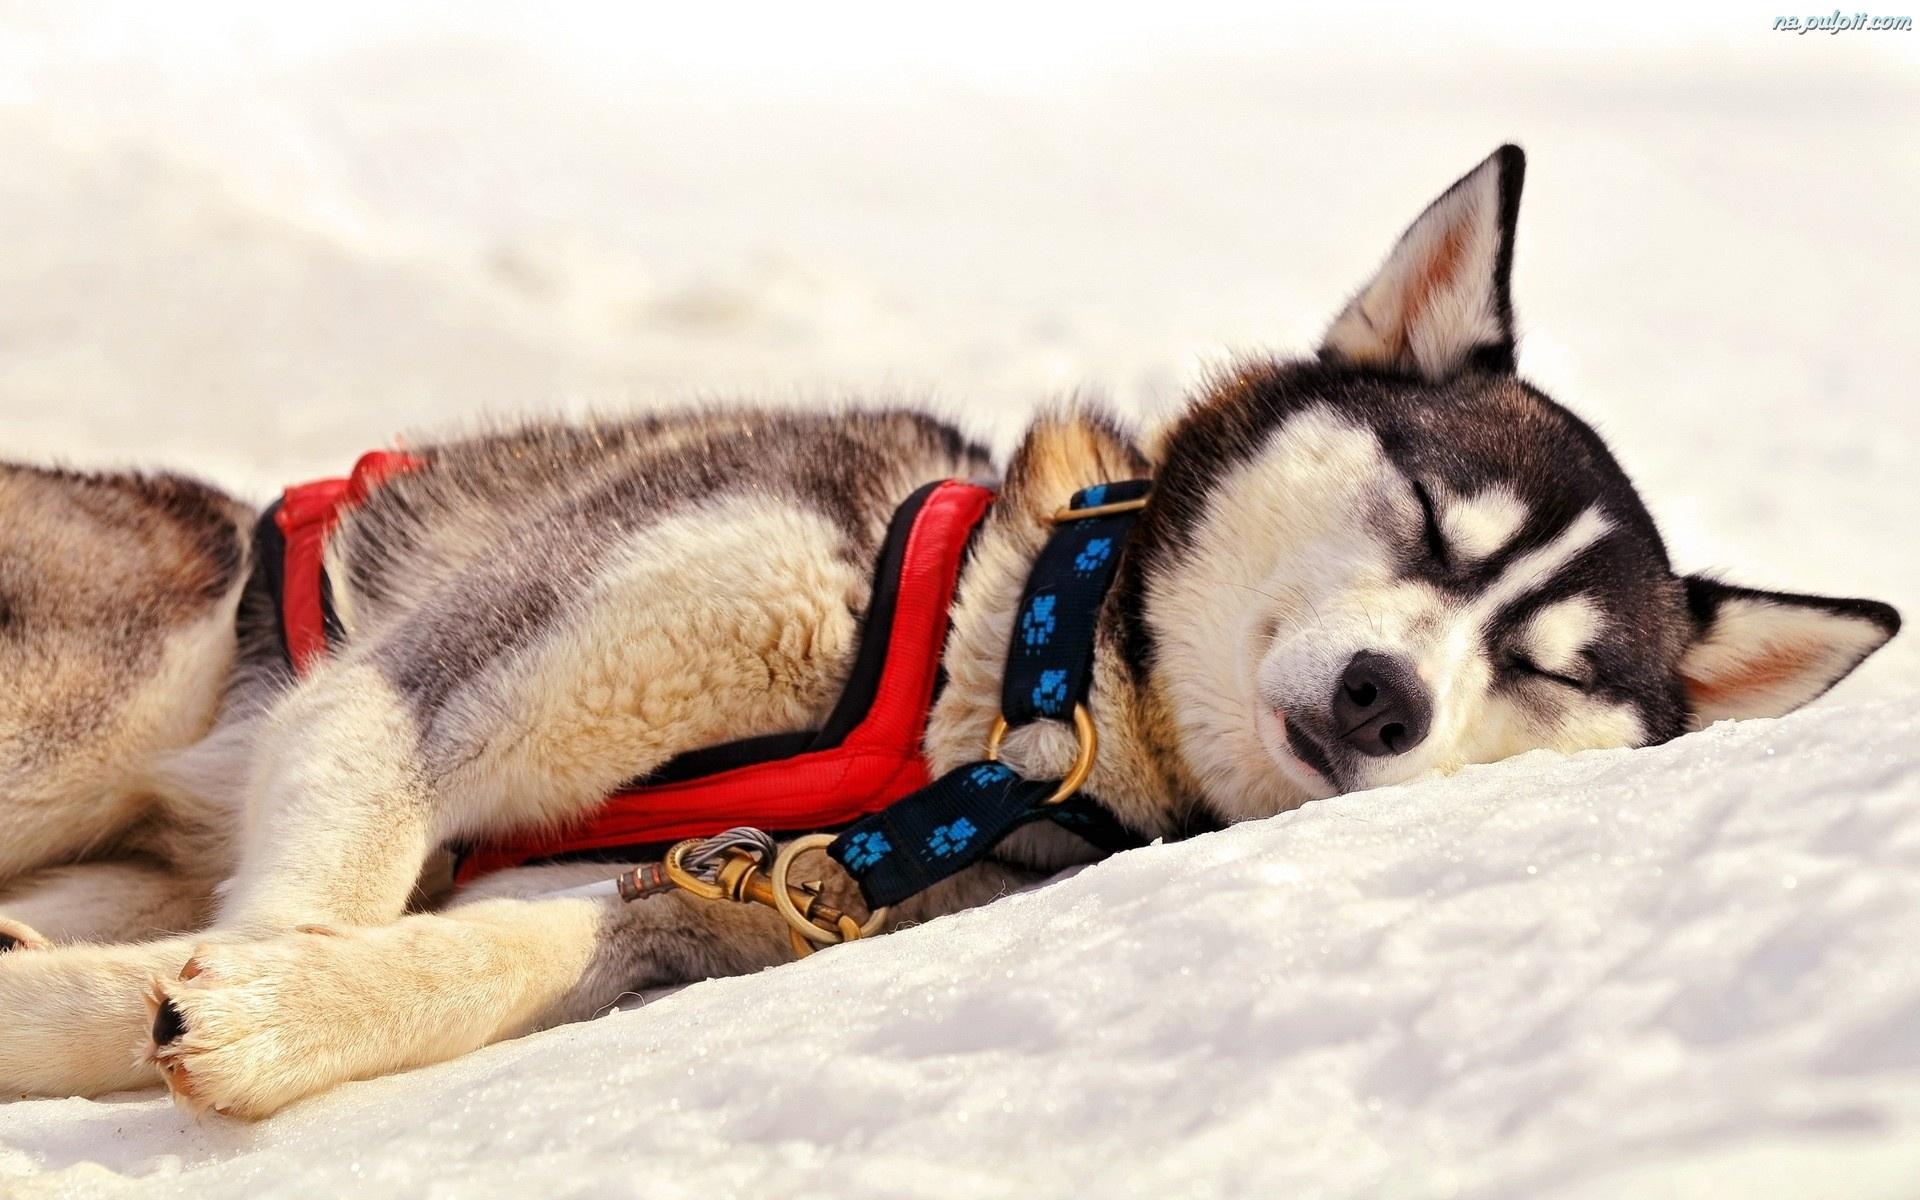 Odpoczynek, Husky, Śnieg Na Pulpit